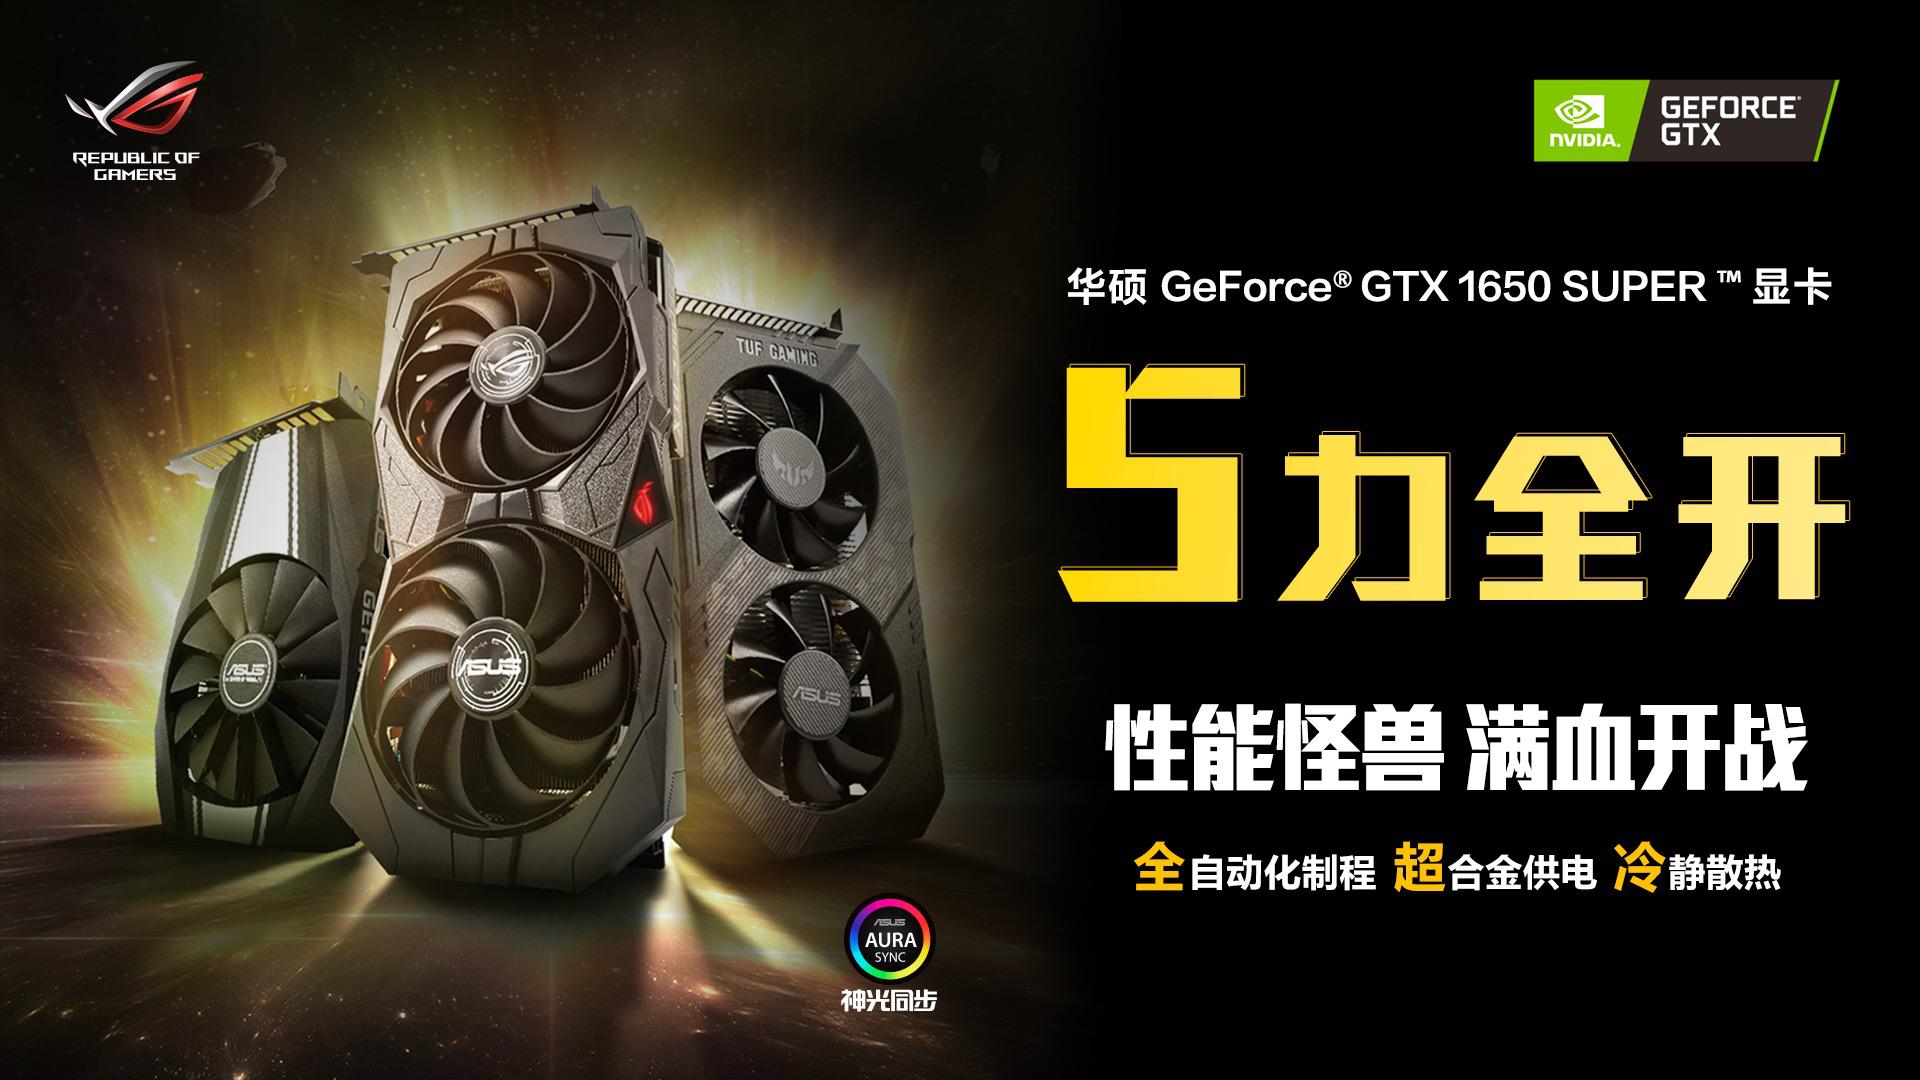 S级甜品 华硕GeForce® GTX1650 SUPER™系列显卡上市